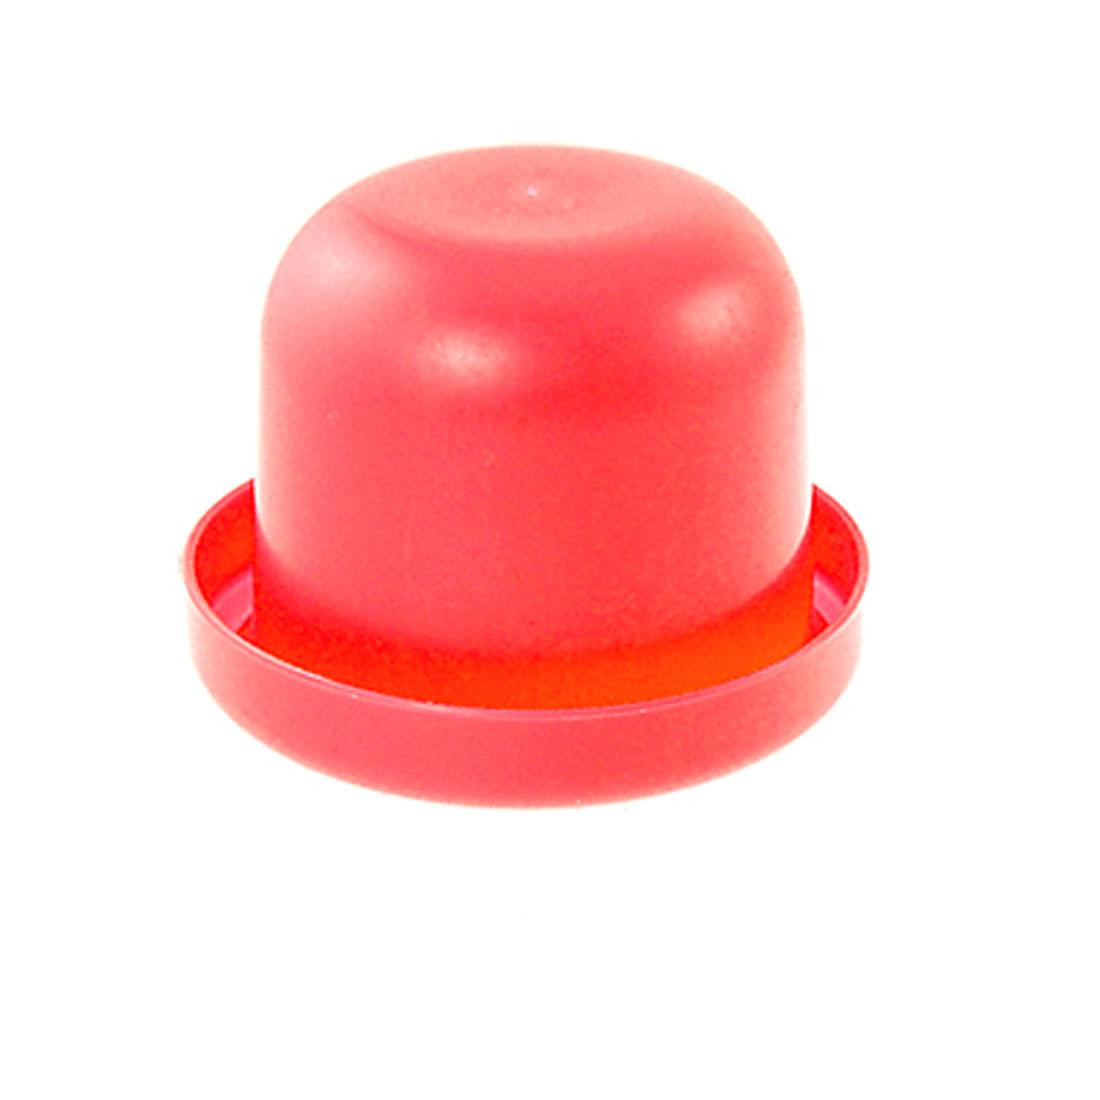 KTV Pub Casino Games Tool Red Plastic Dice Shaker Cup